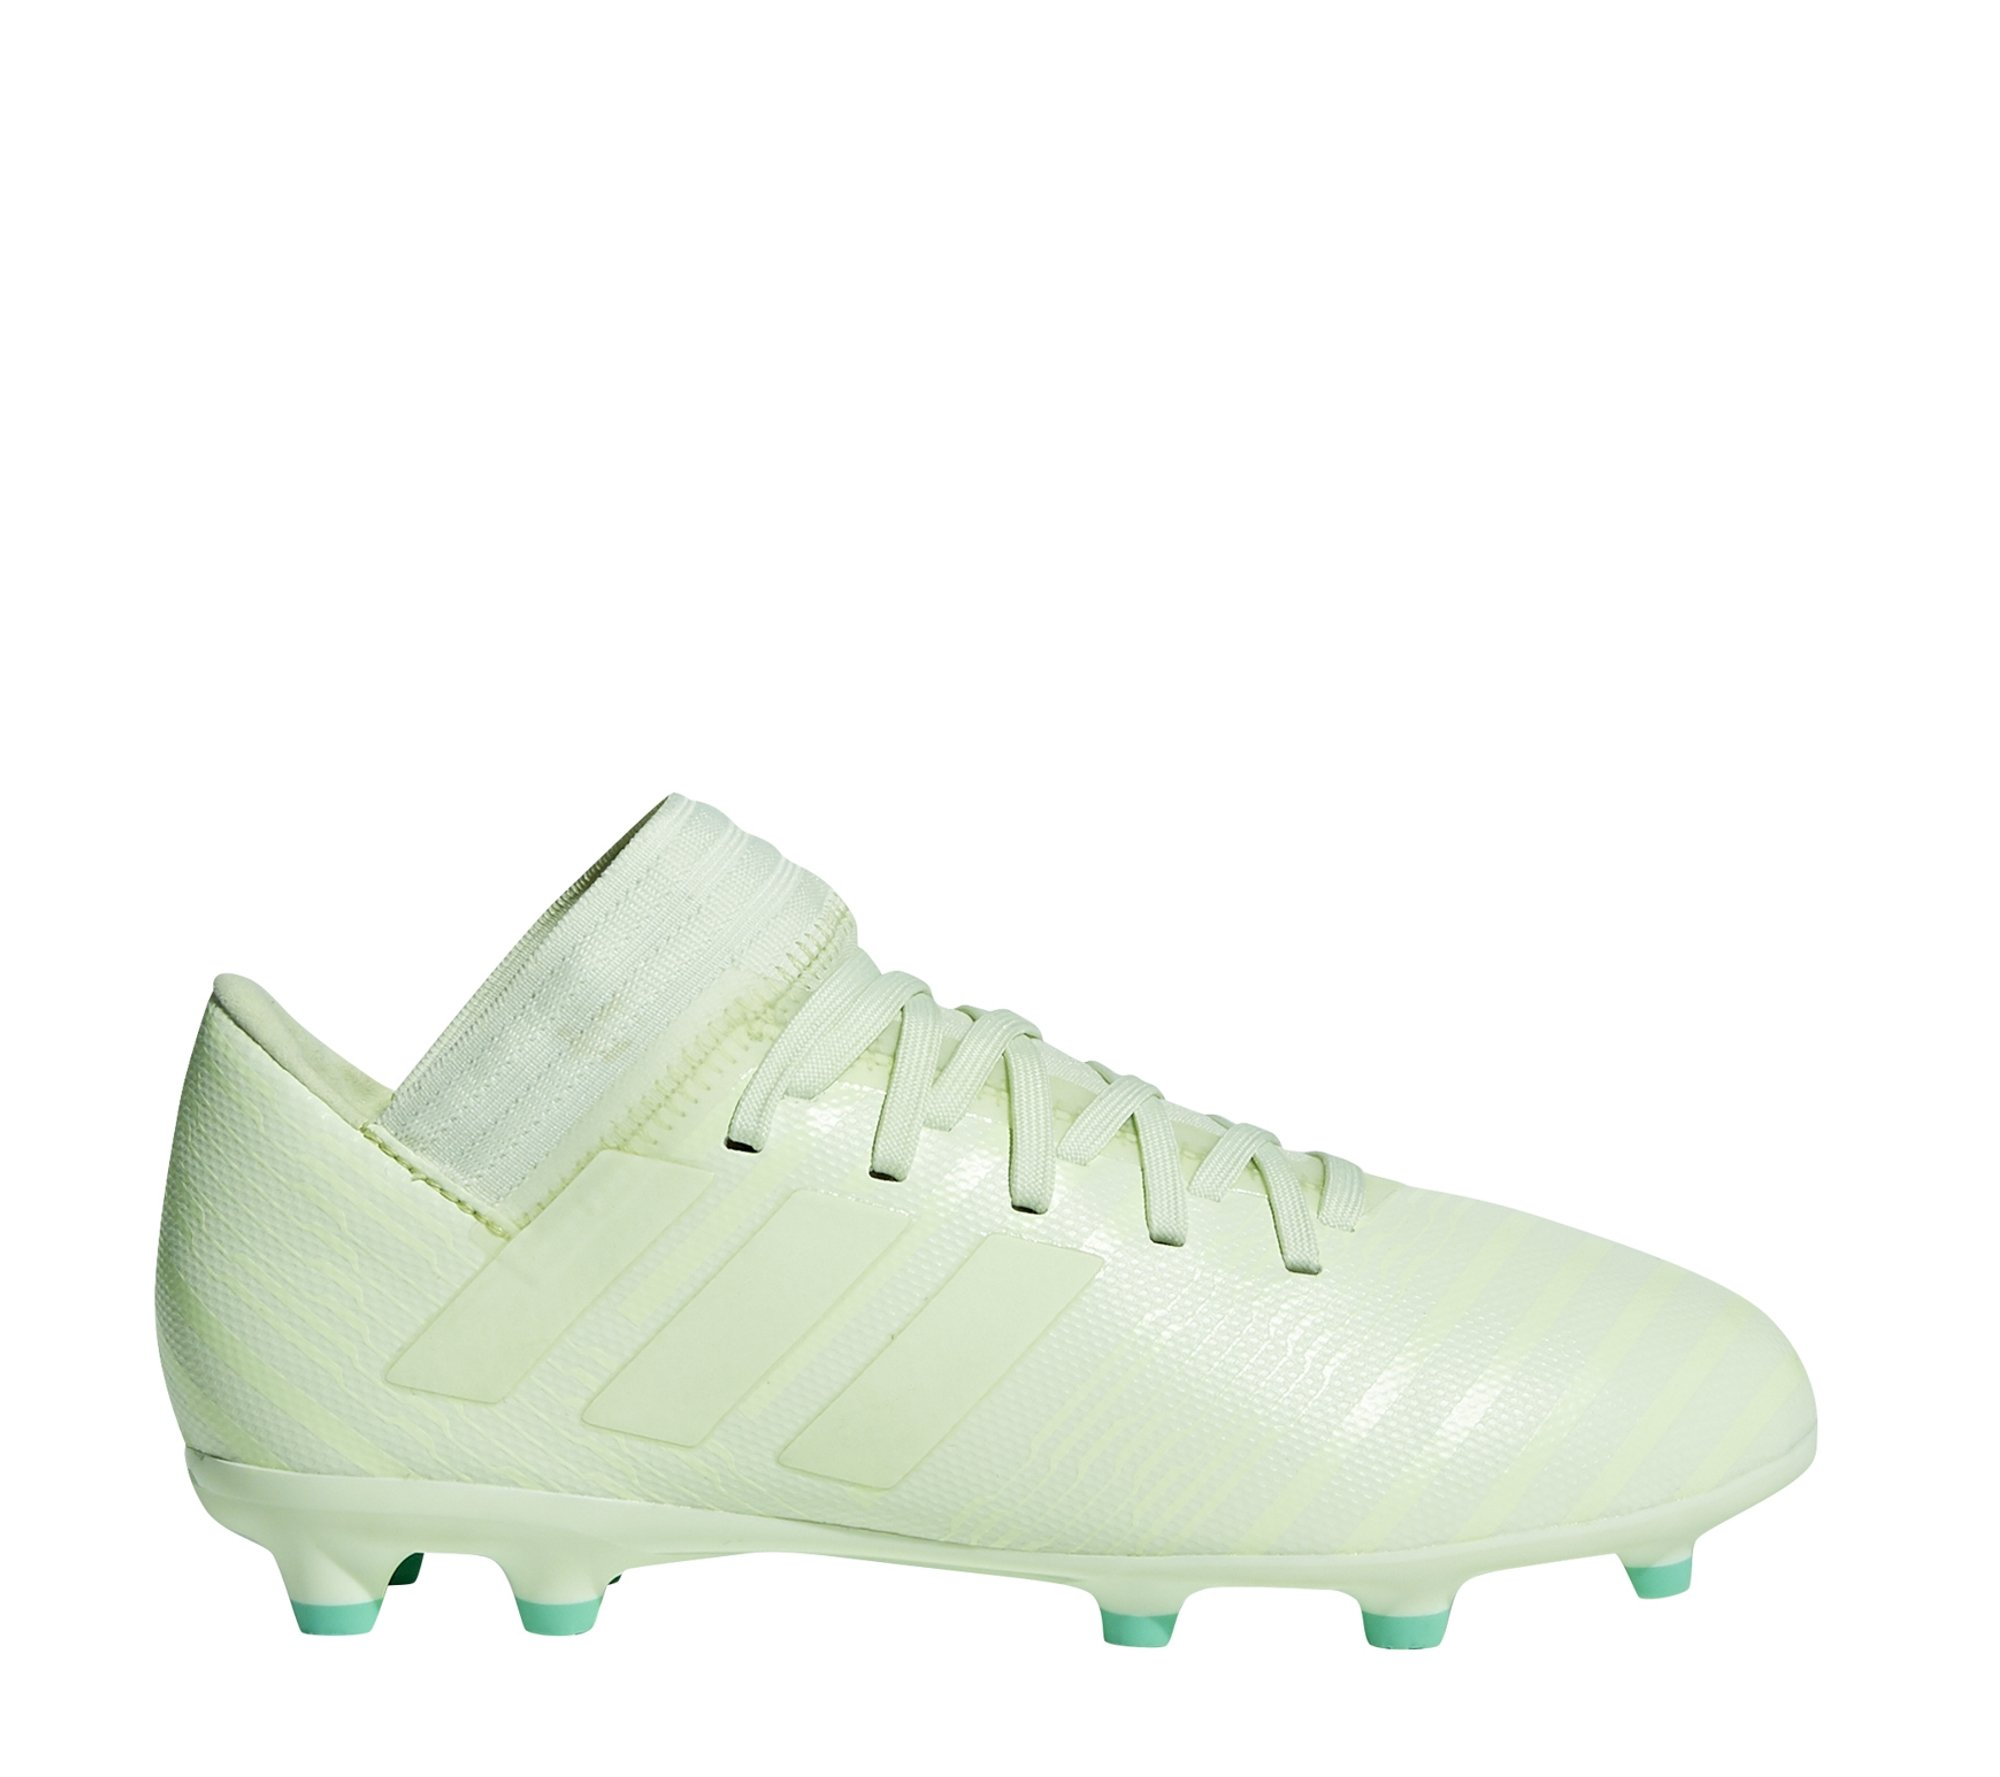 wit groene Kids Voetbalschoen Adidas Nemiziz 17.3 FG J - CP9167